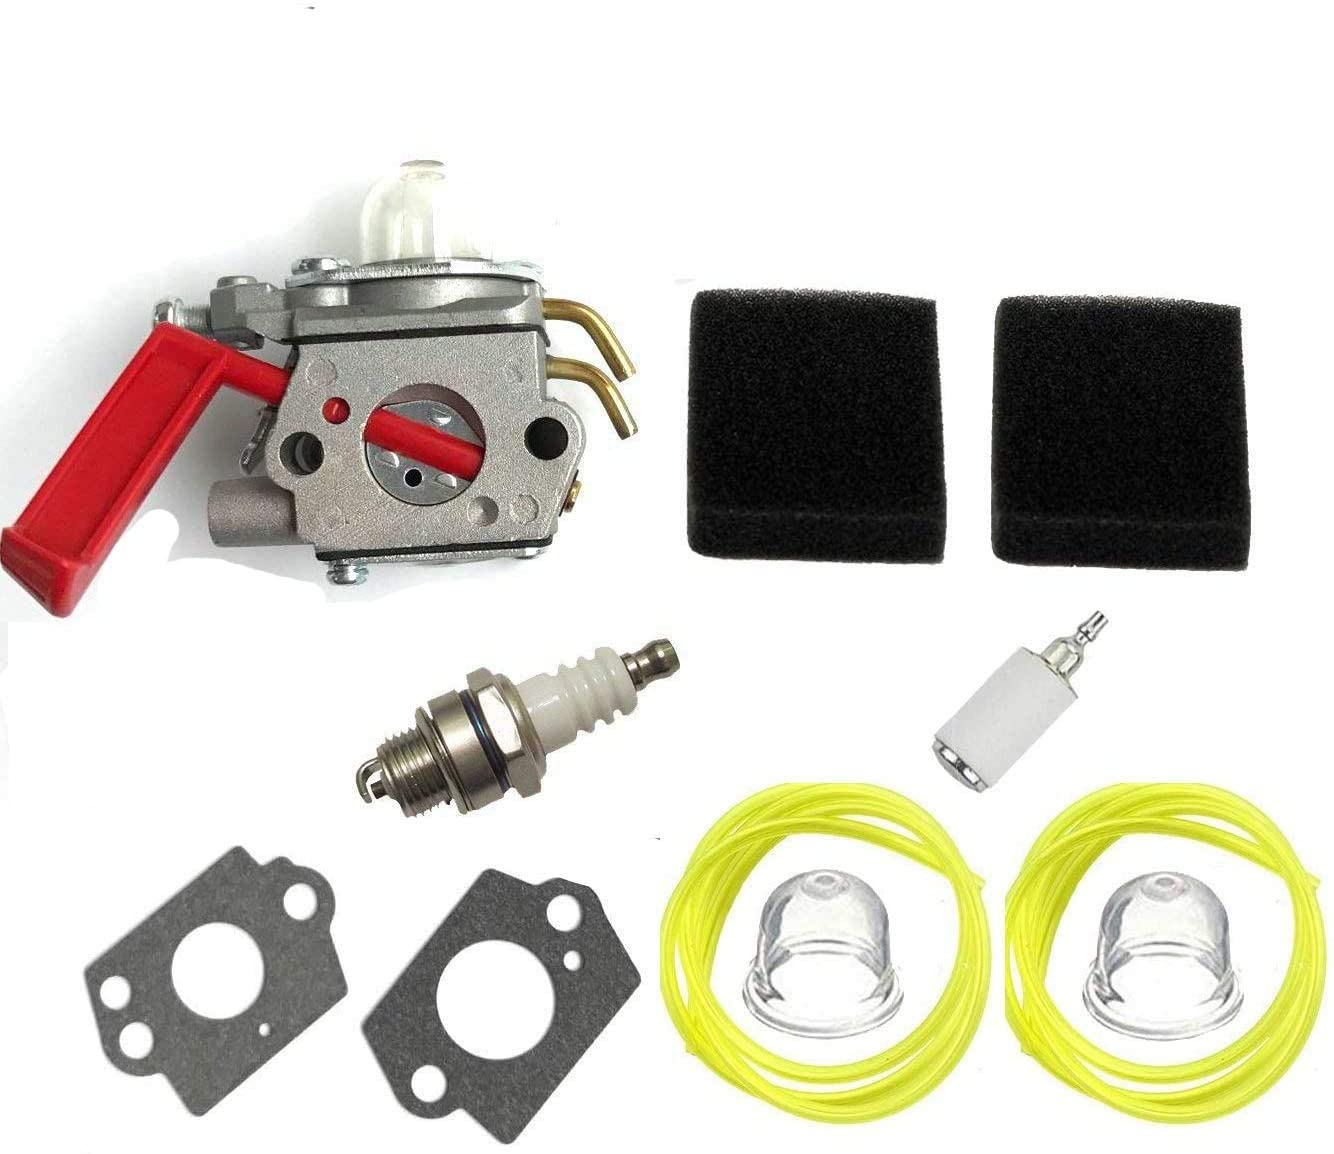 HQParts Carburetor Carb for ZAMA C1U-H47 C1U-H39A UP00608A UP00608 UP00021 B25C BC2500R D725CD D825SB F2020 F3040 F3050